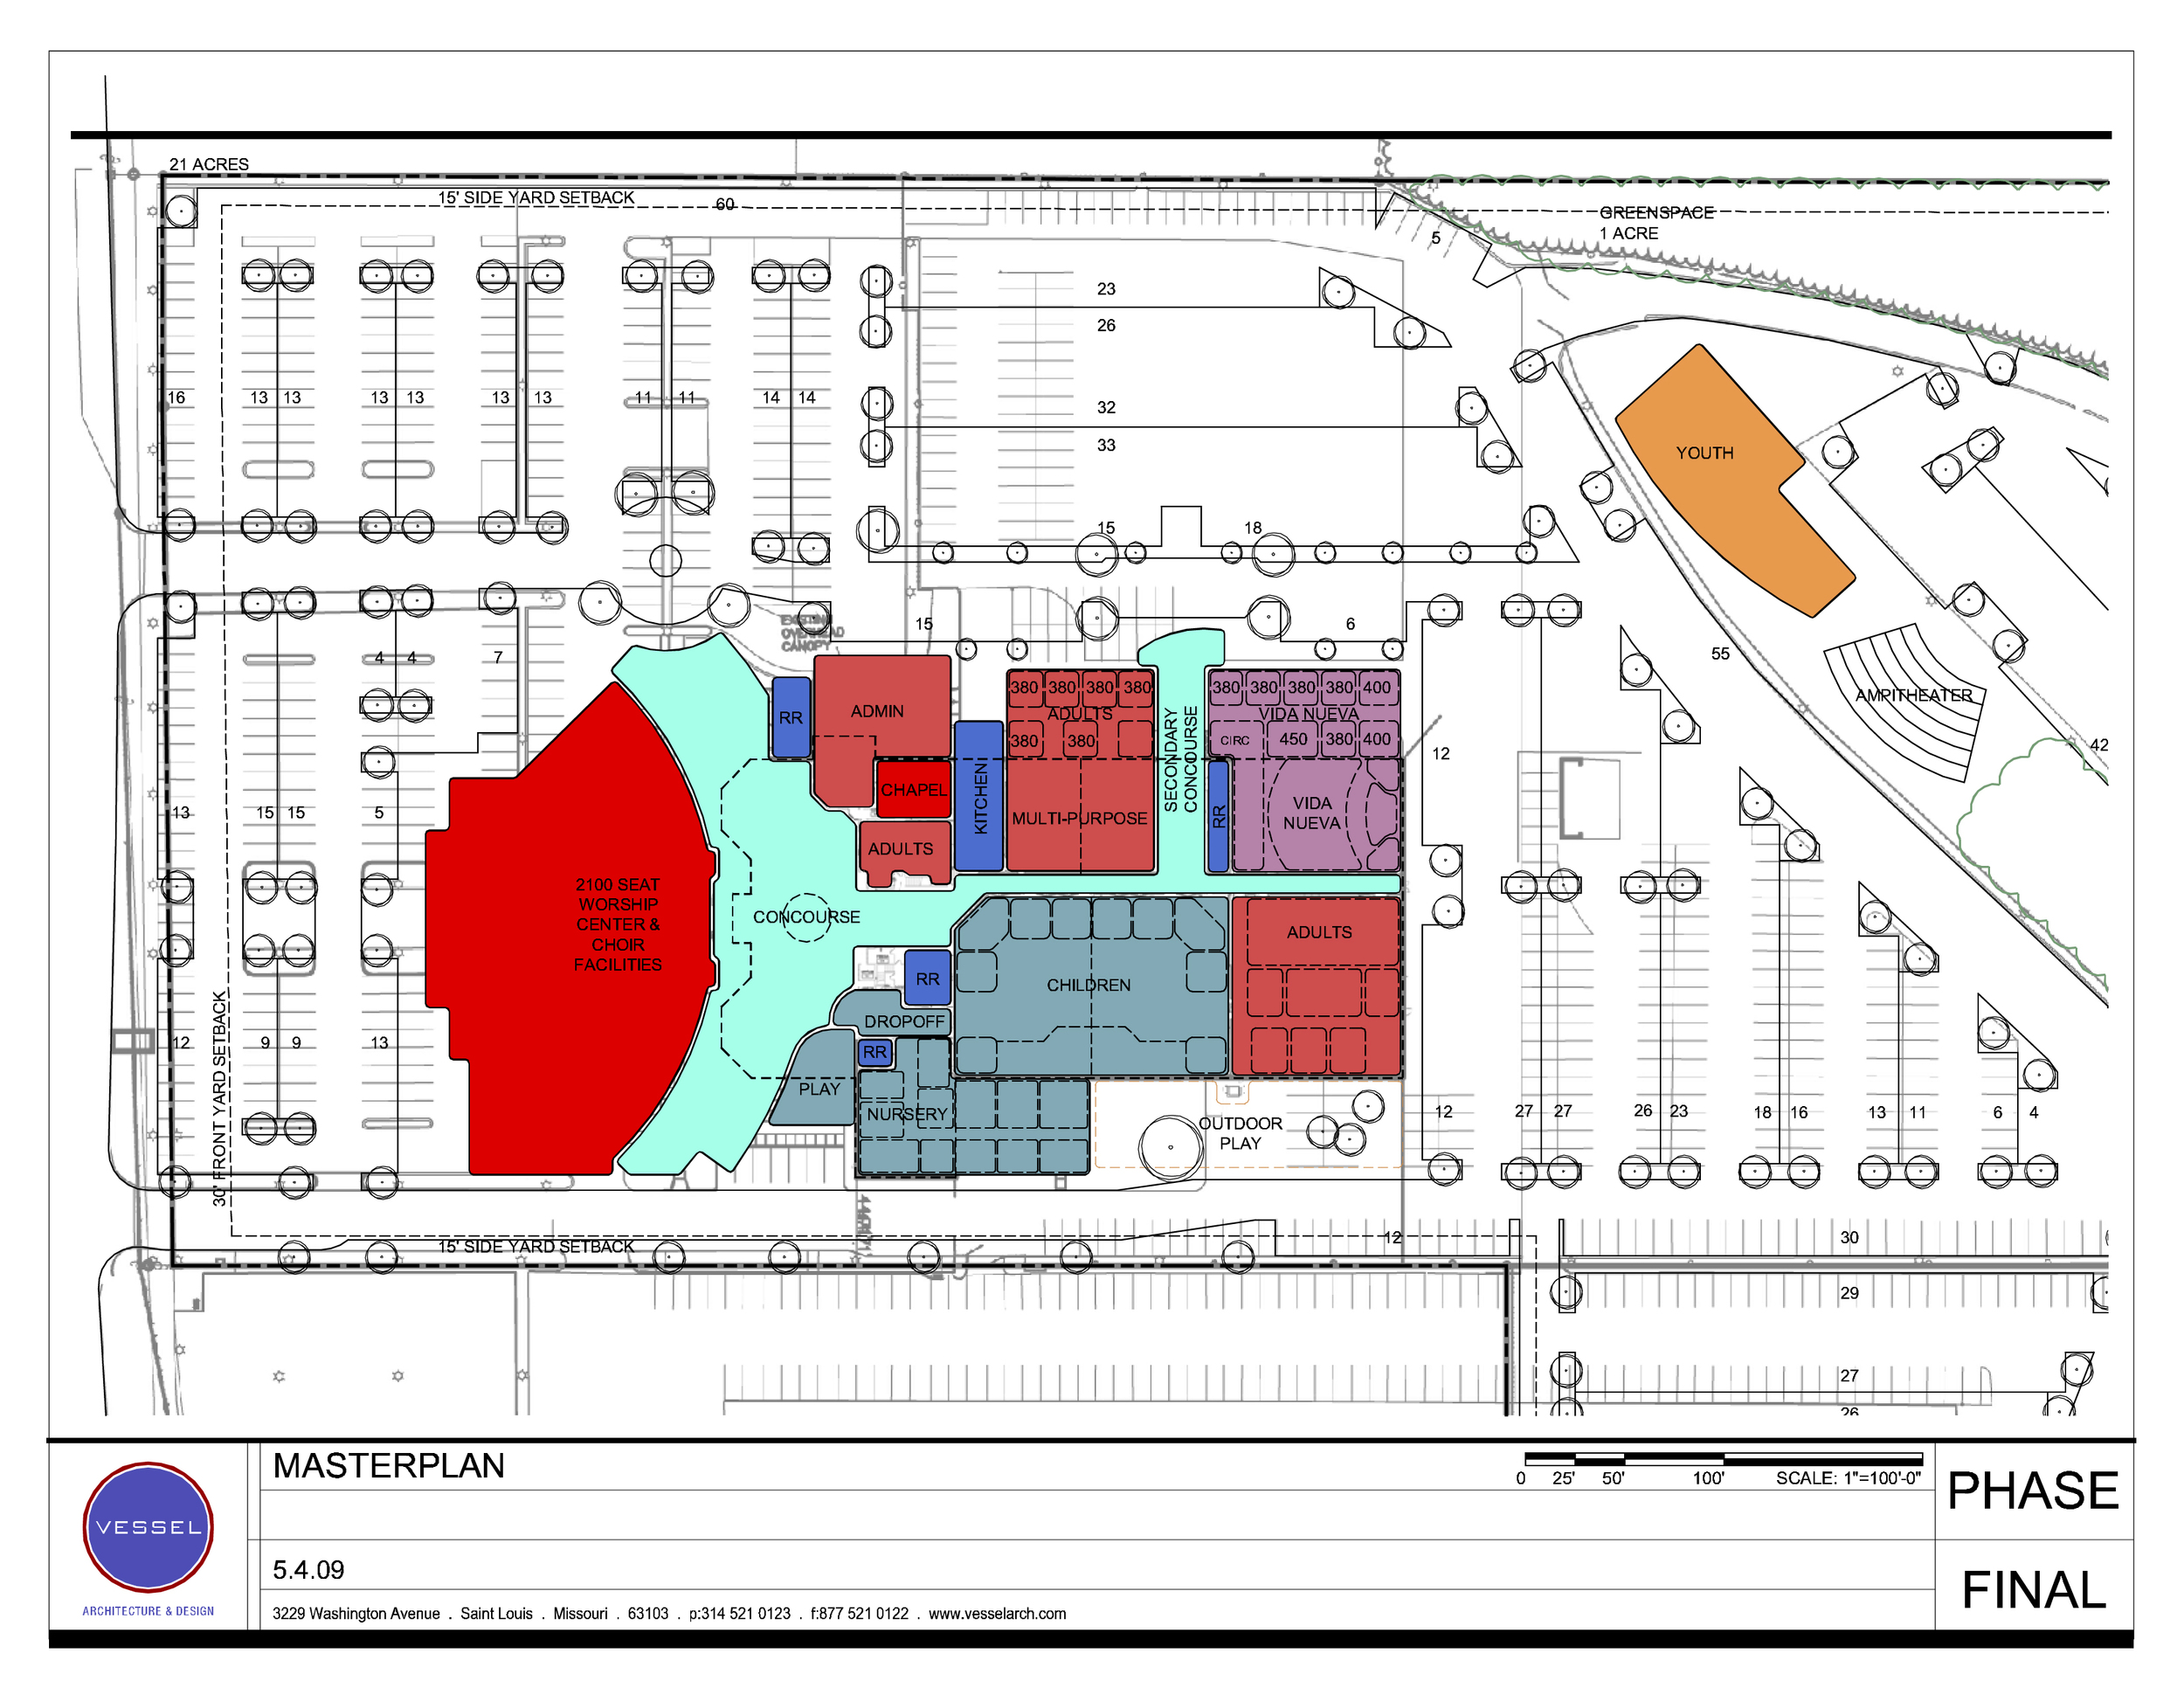 \\Vessel-Server00\Projects\09002 - St Charles Assembly\Masterpla